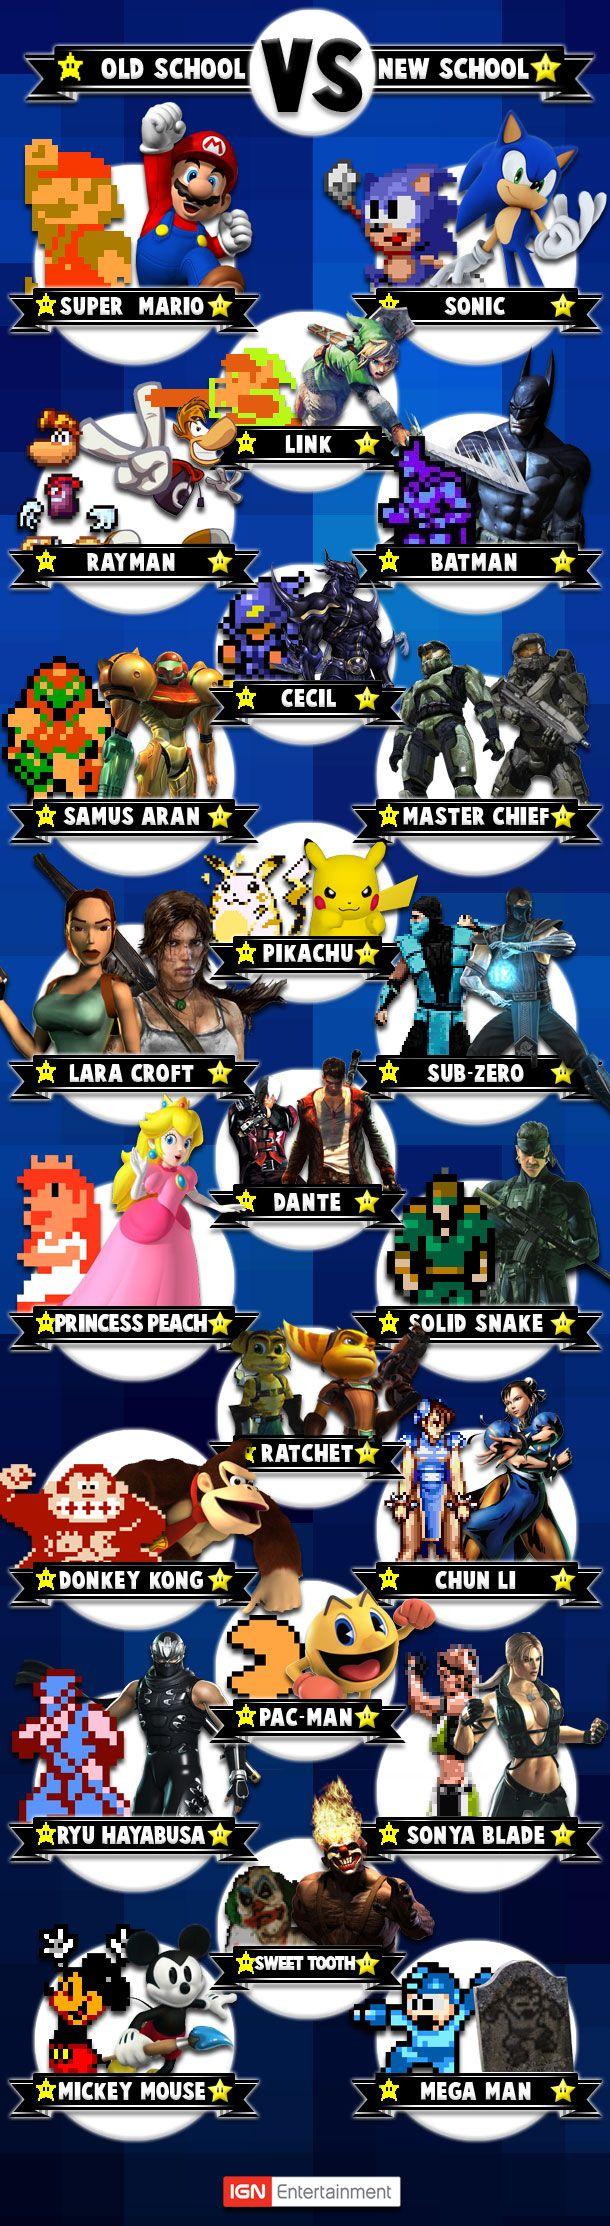 Video Game Characters: Old School v. New School. Mega Man makes me sad